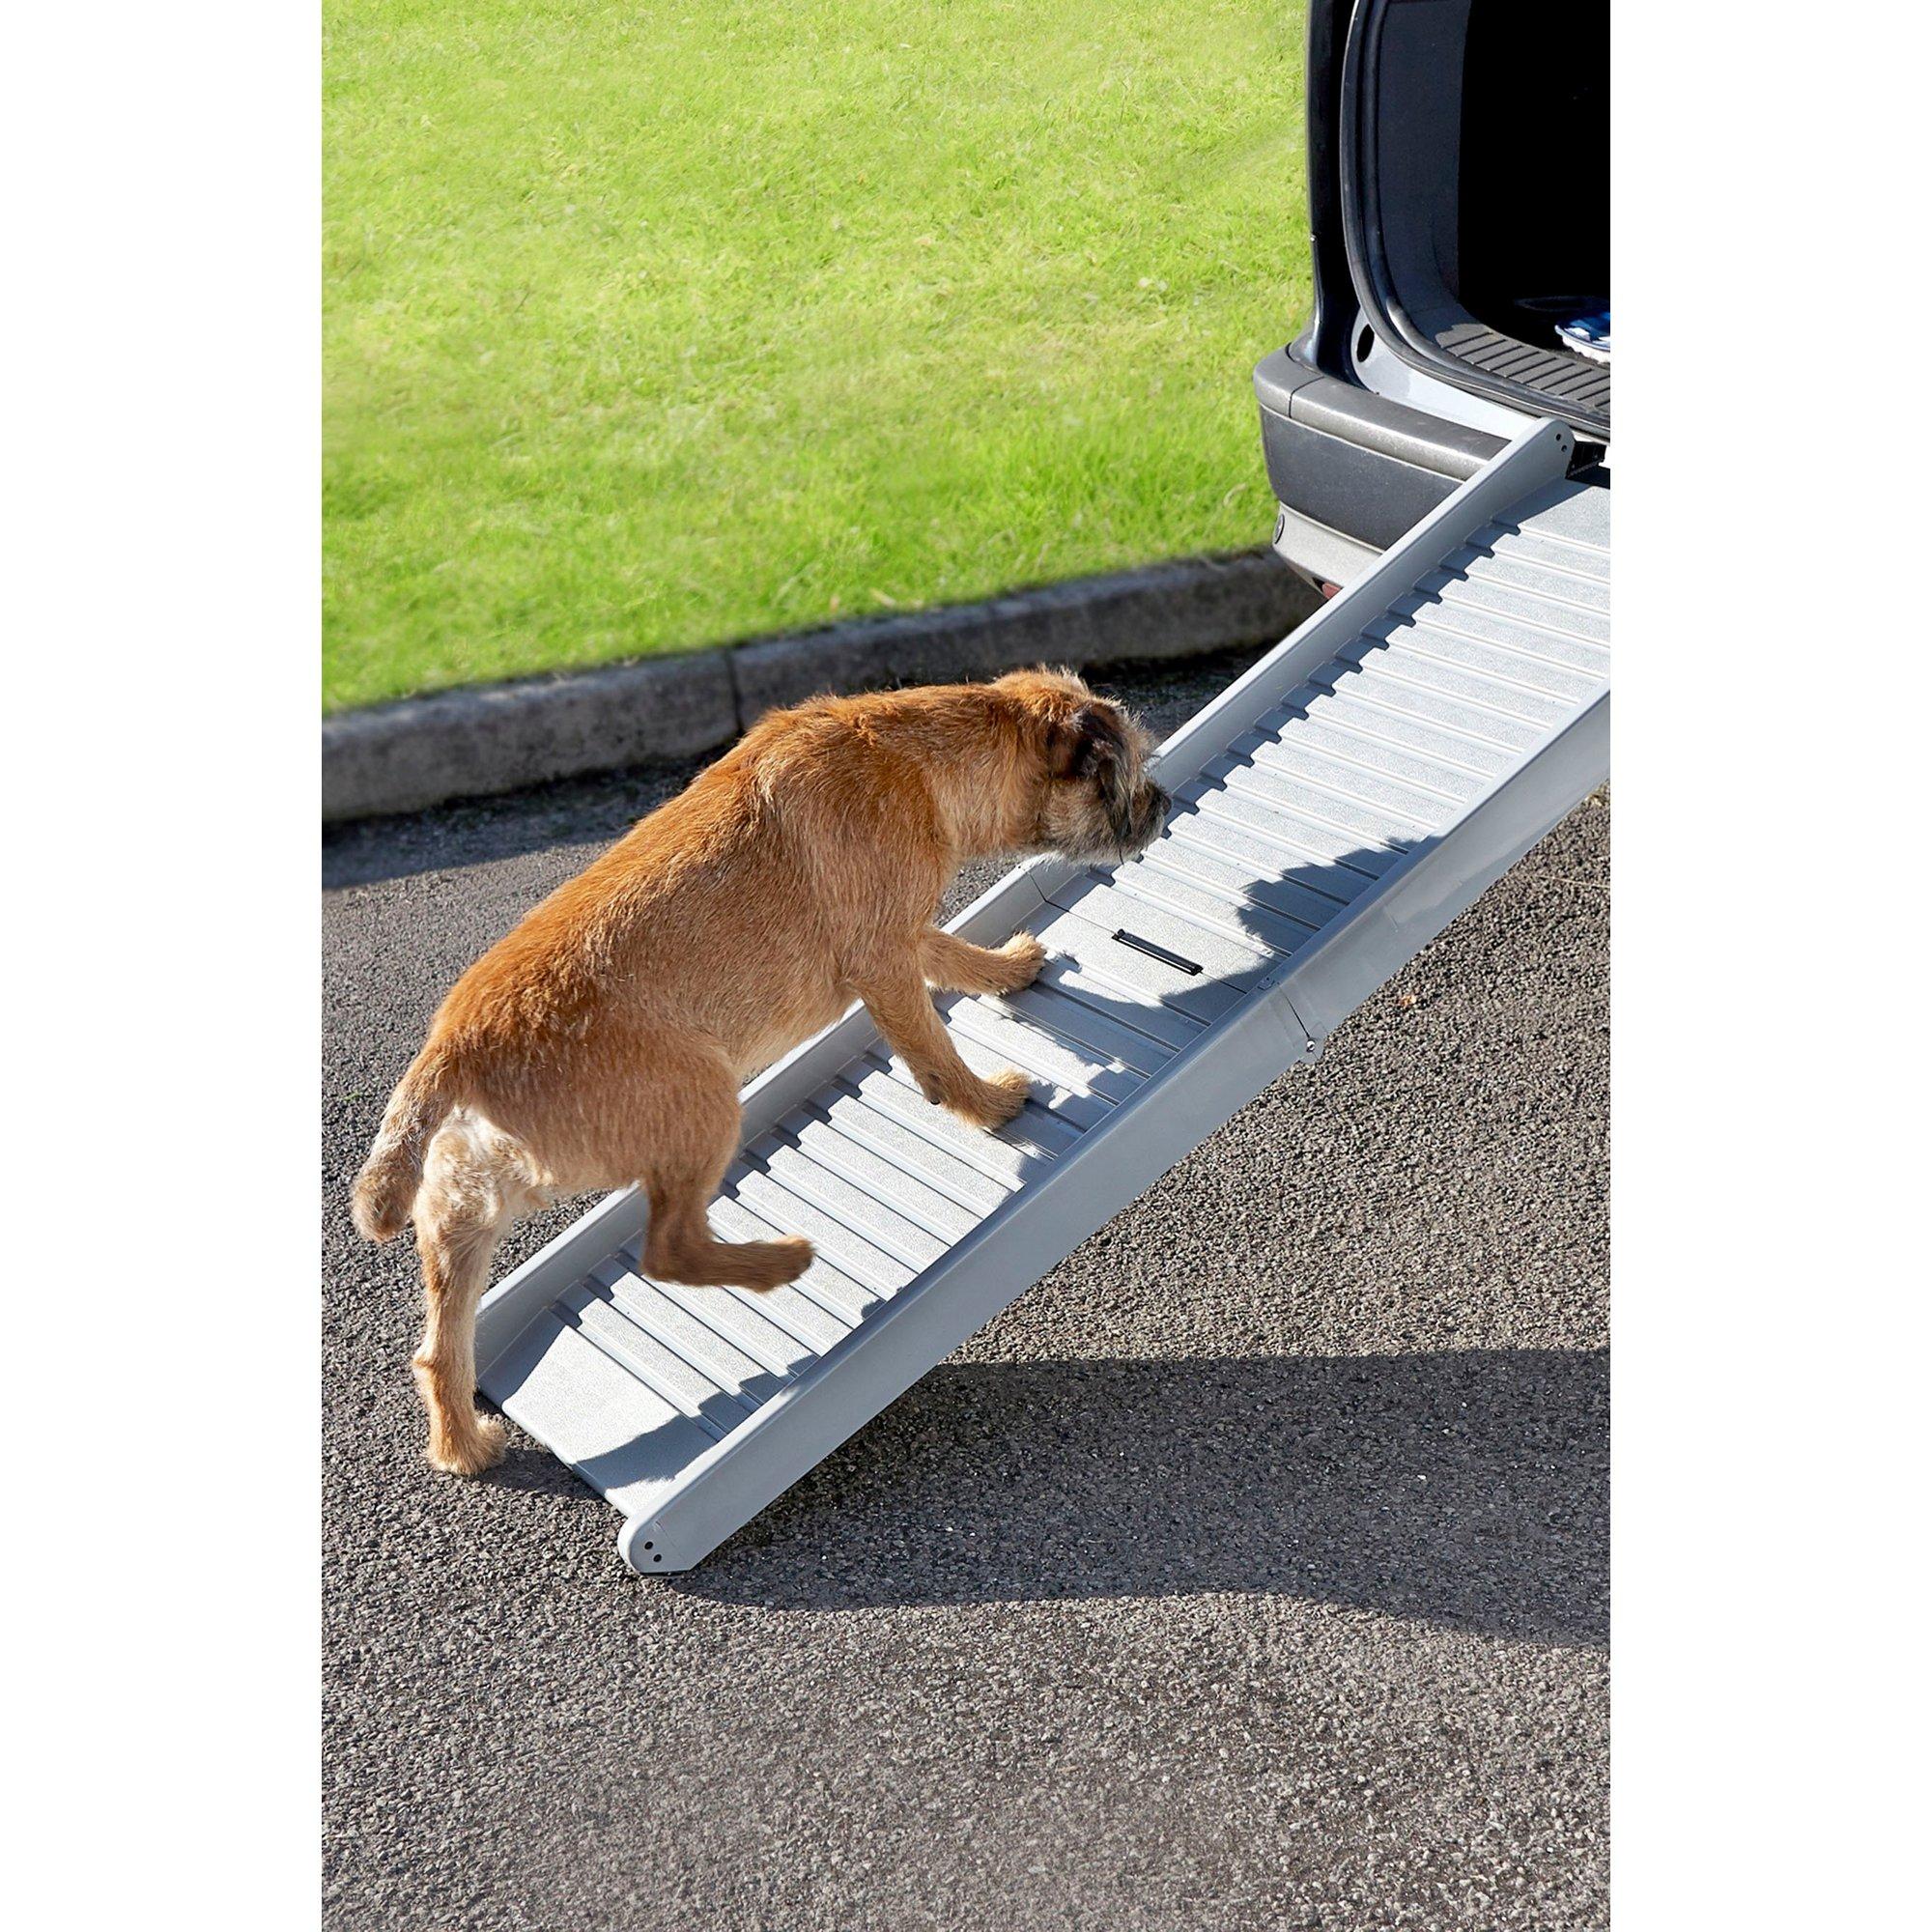 Image of Portable Folding Pet Ramp